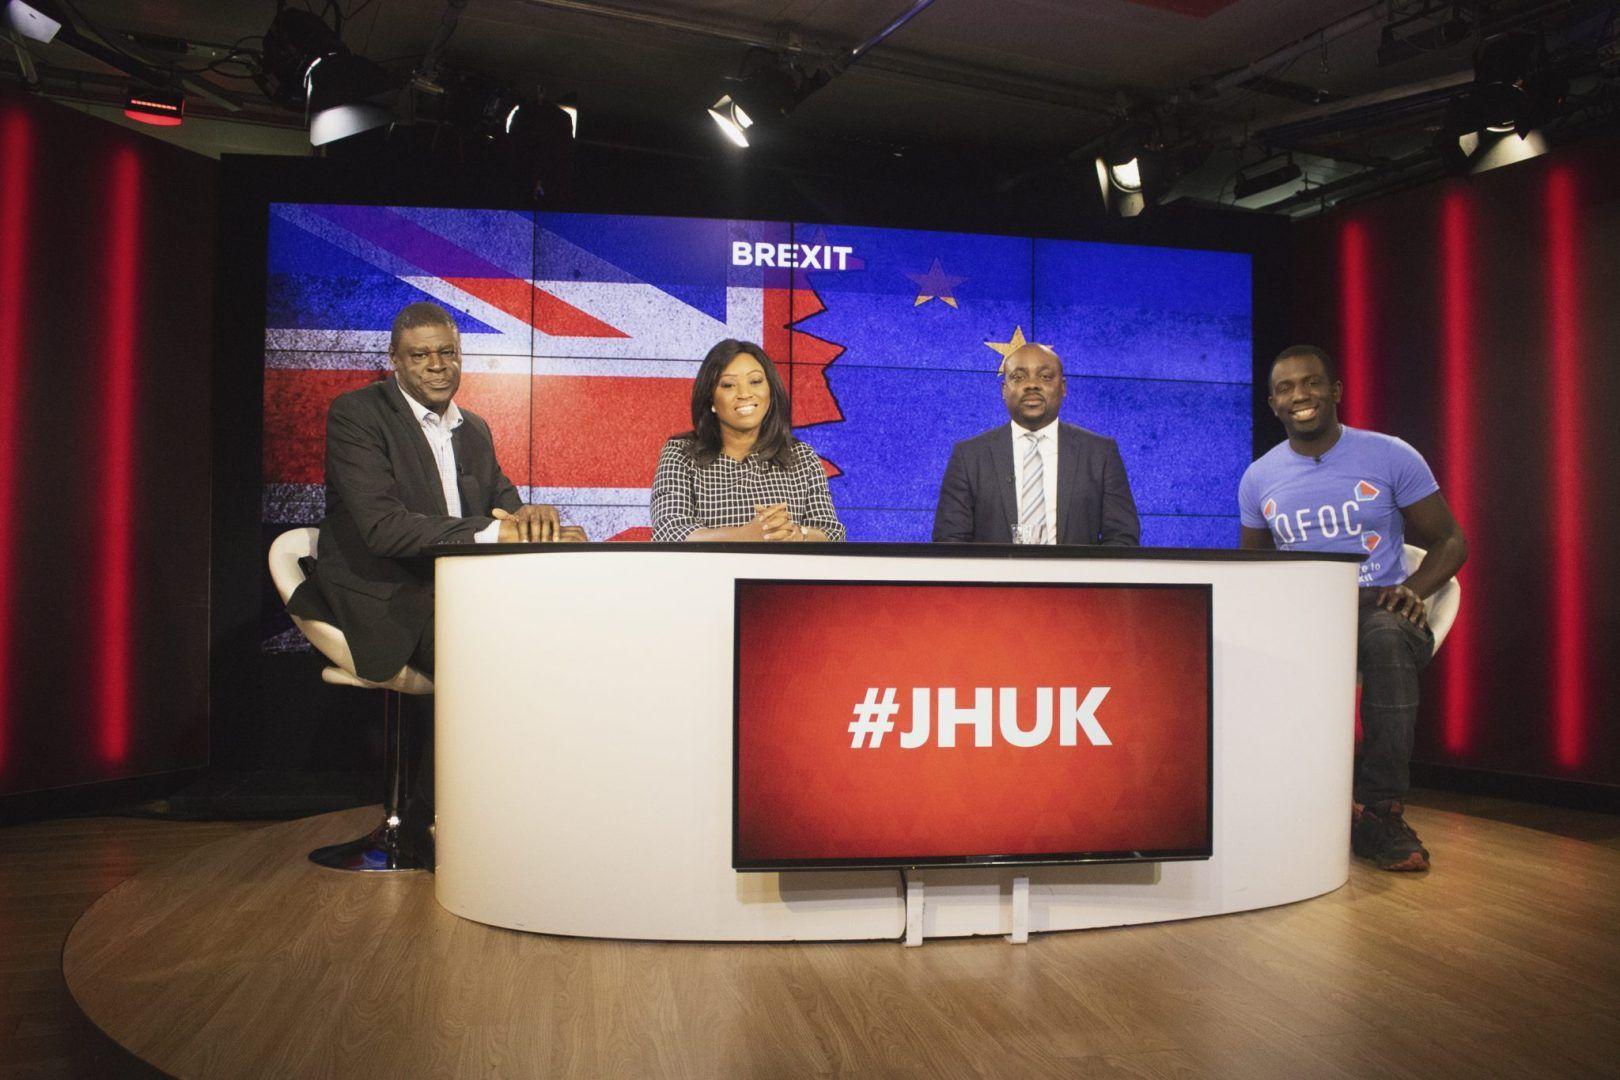 Journalists' Hangout UK